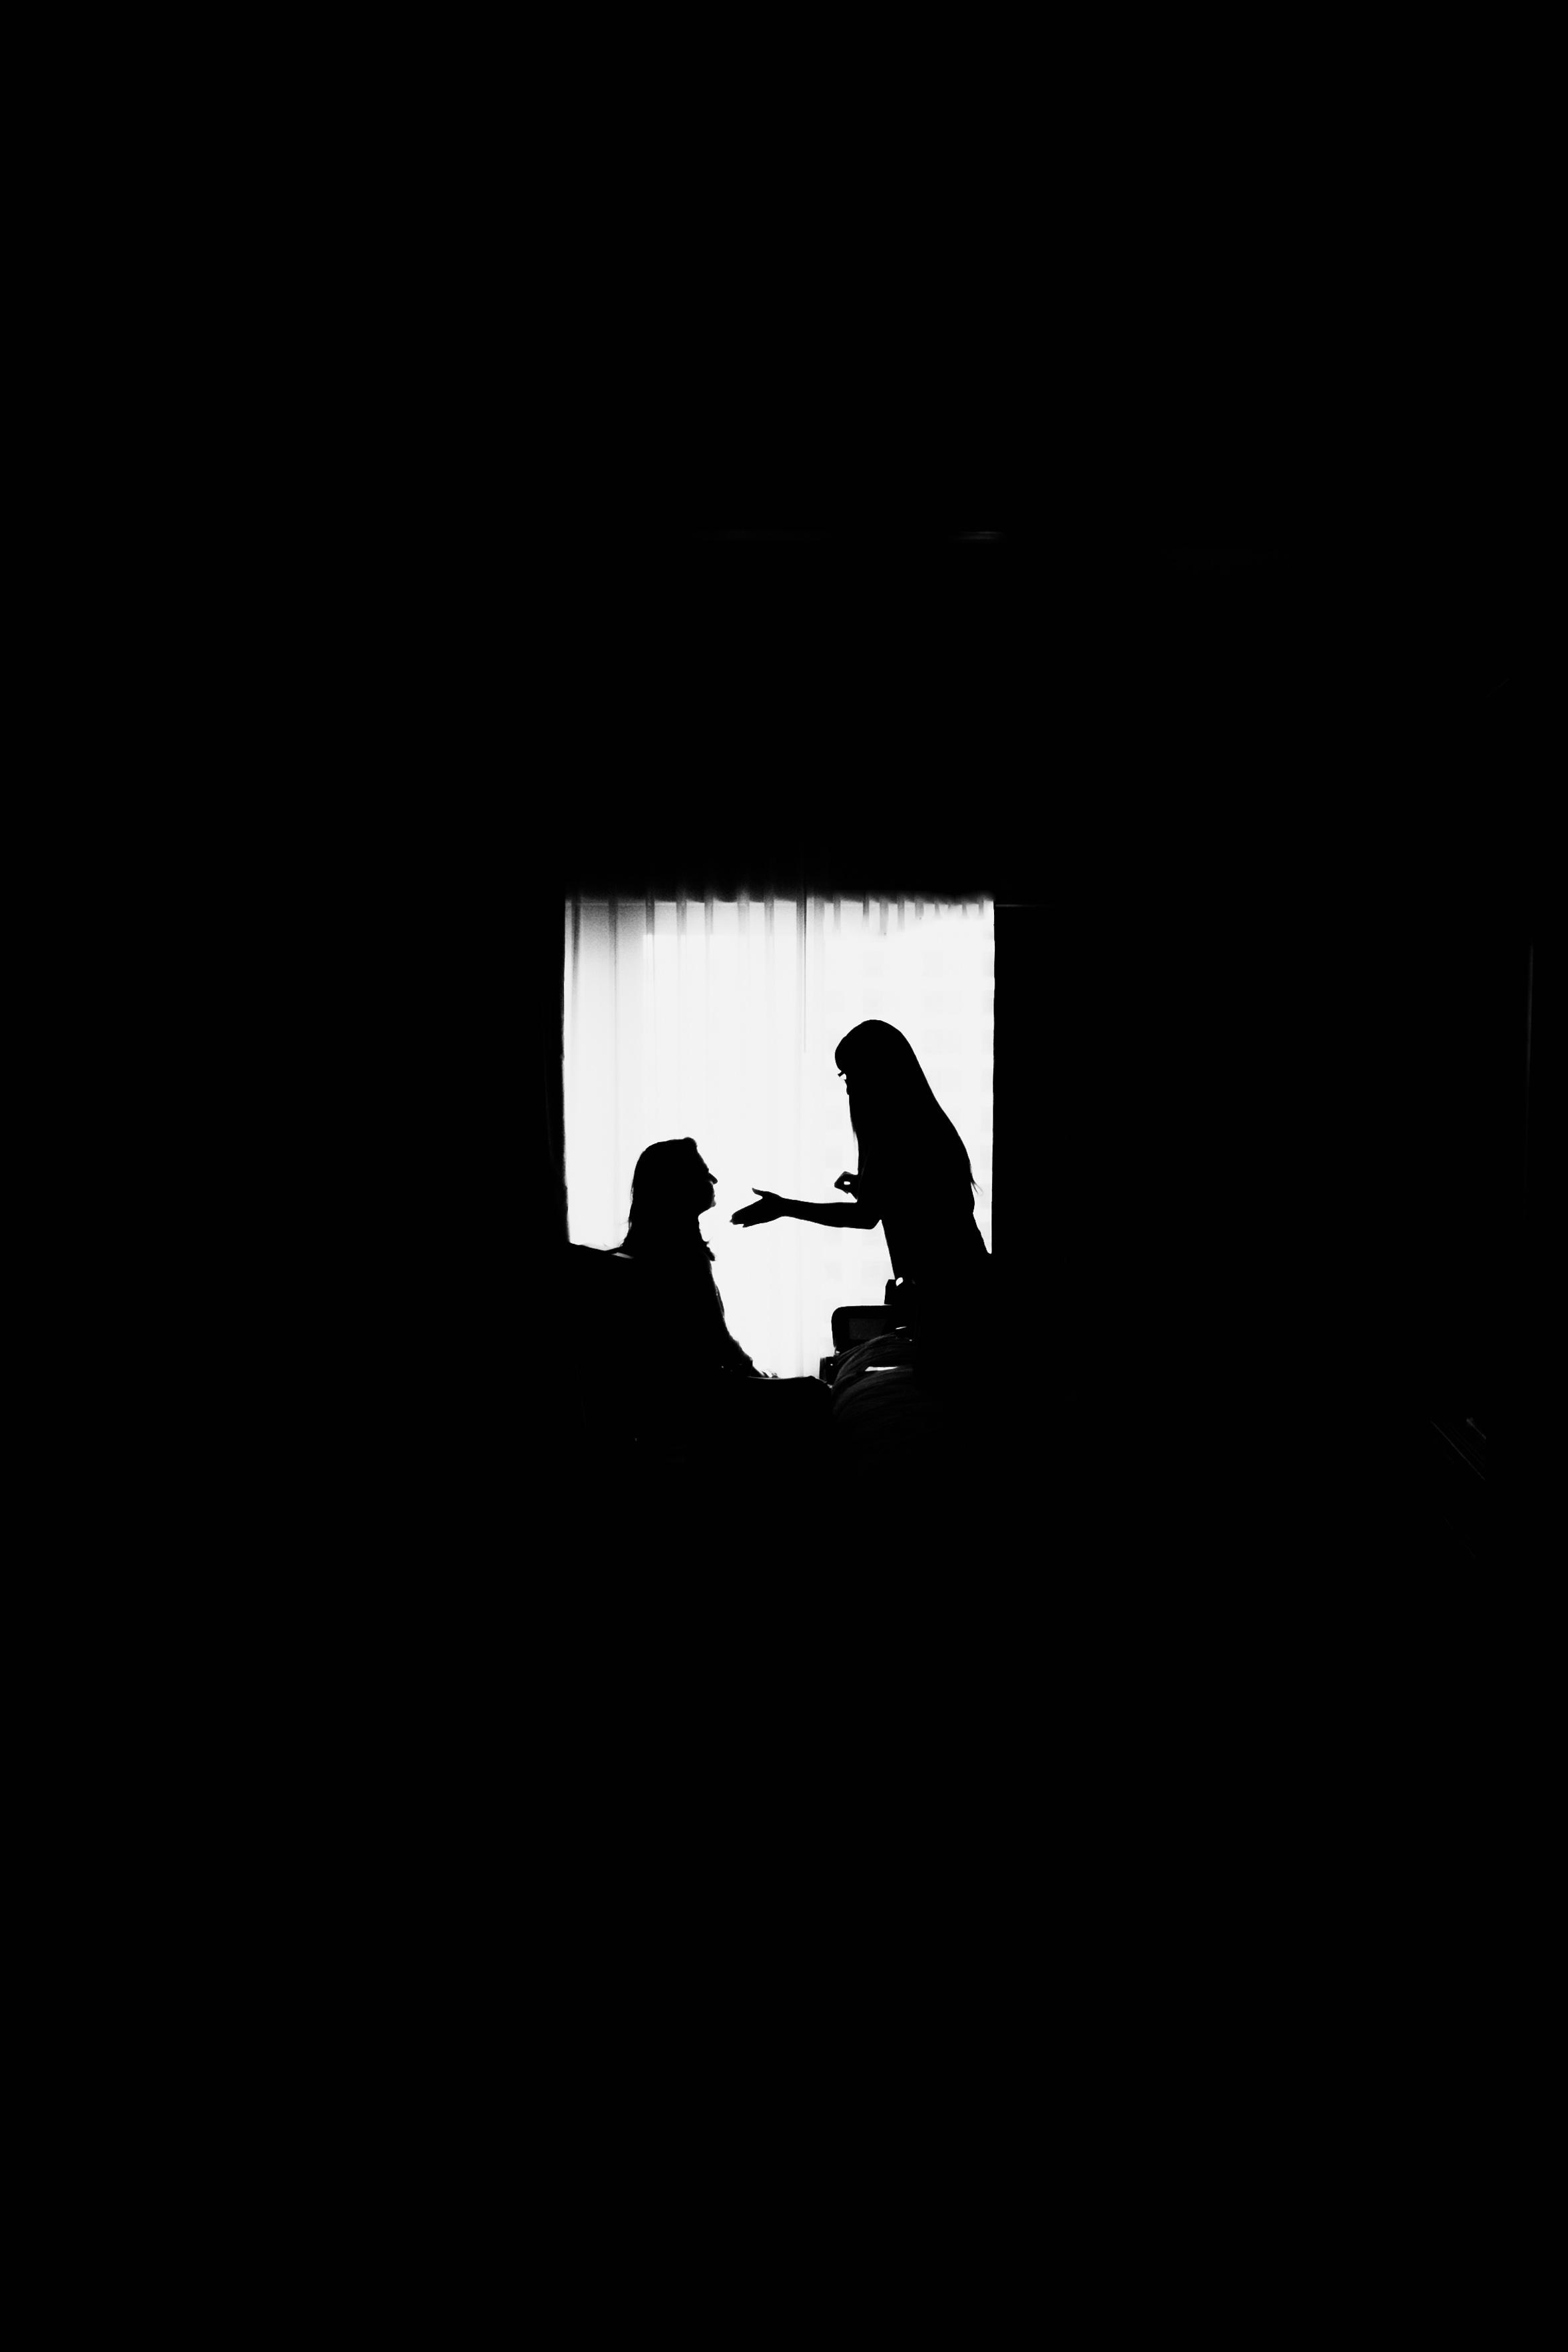 Foreign_Cinema_Wedding_Photography-01.JPG